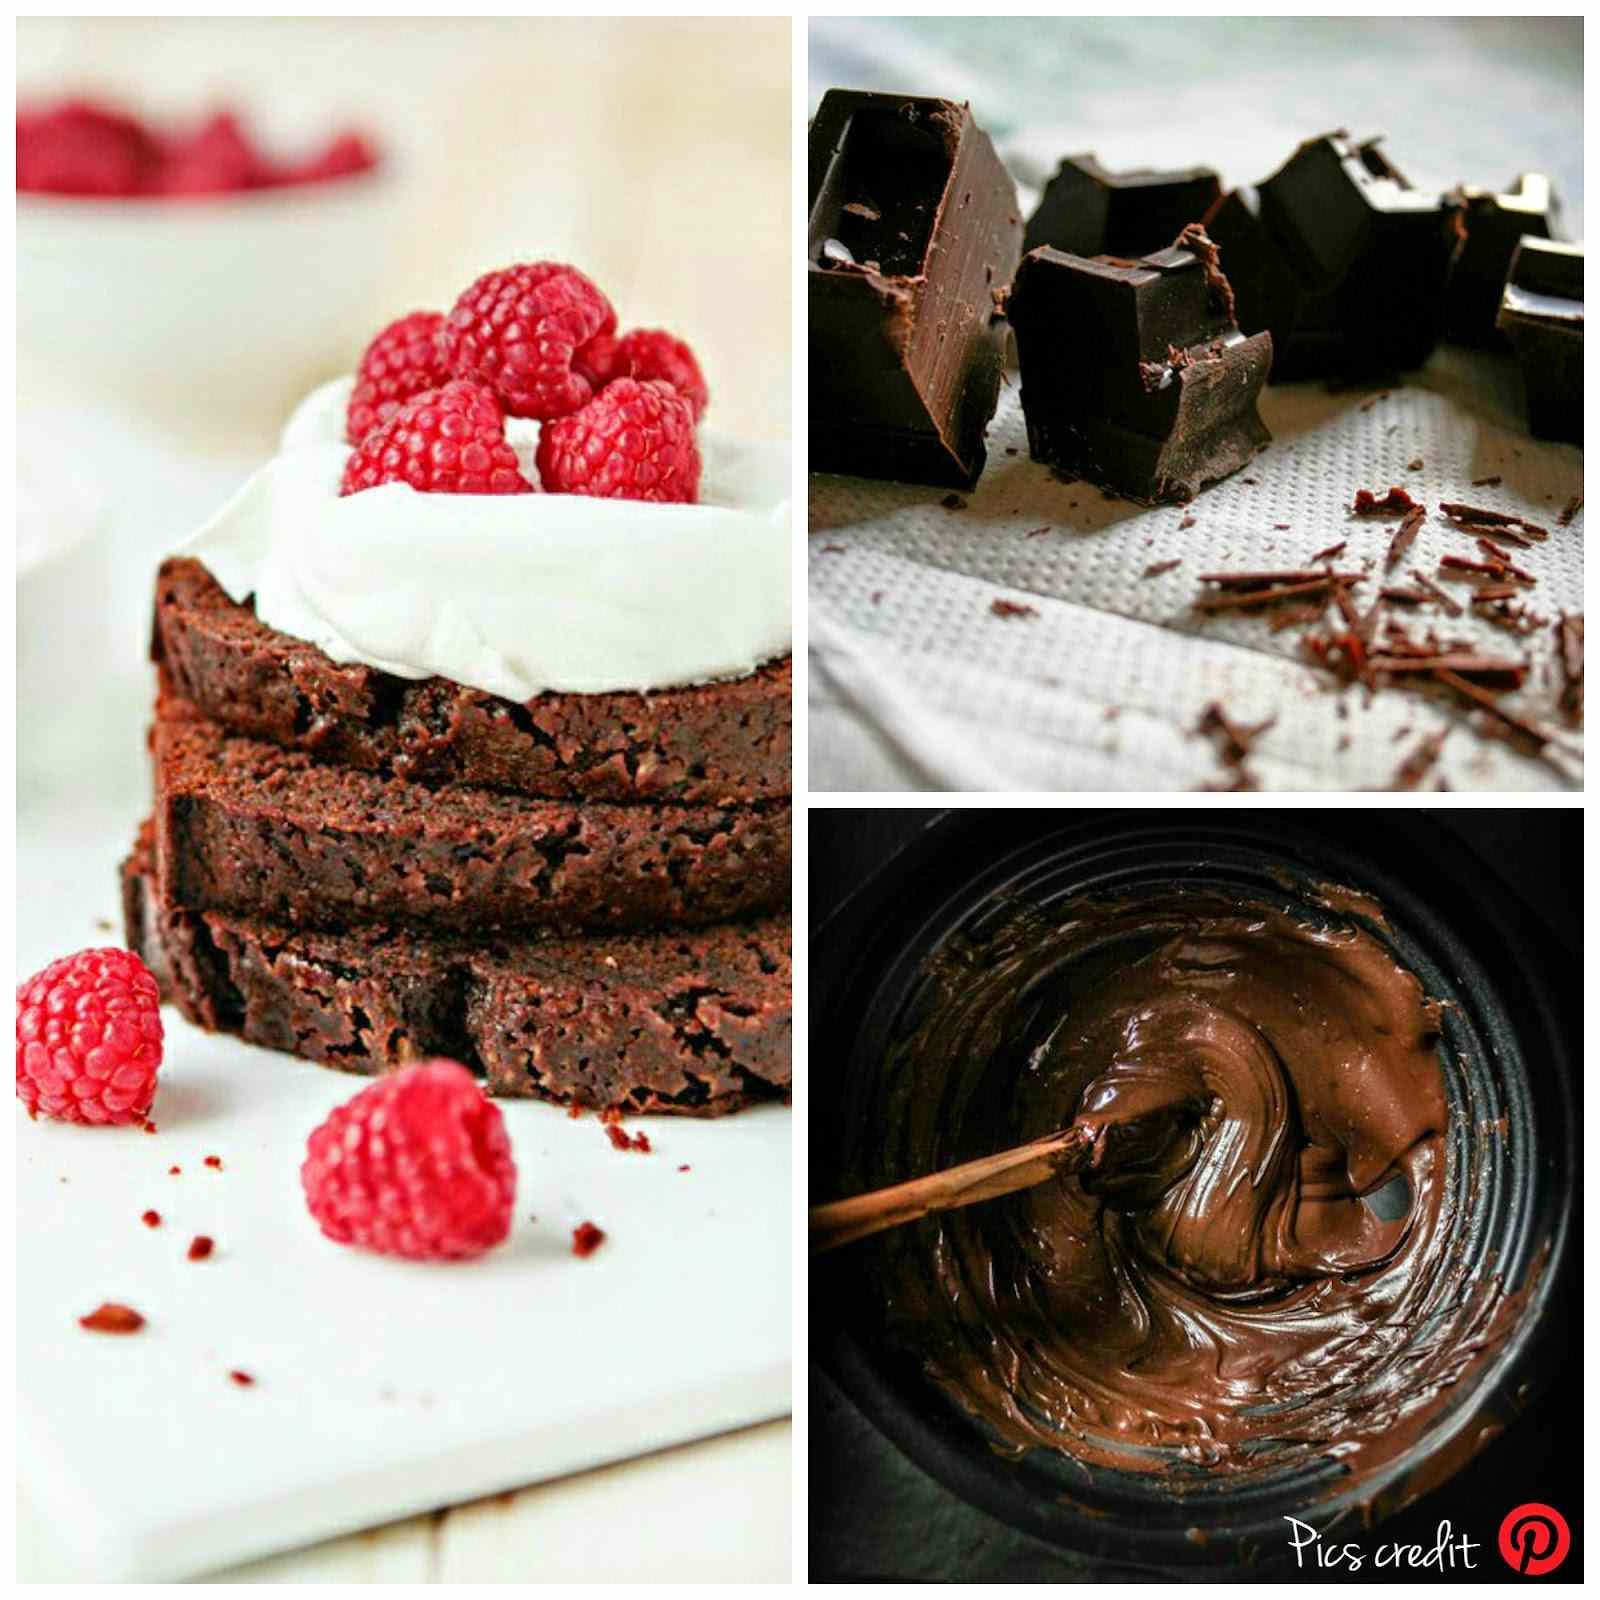 Ricetta: Torta al cioccolato senza farina / chocolate cake without flour